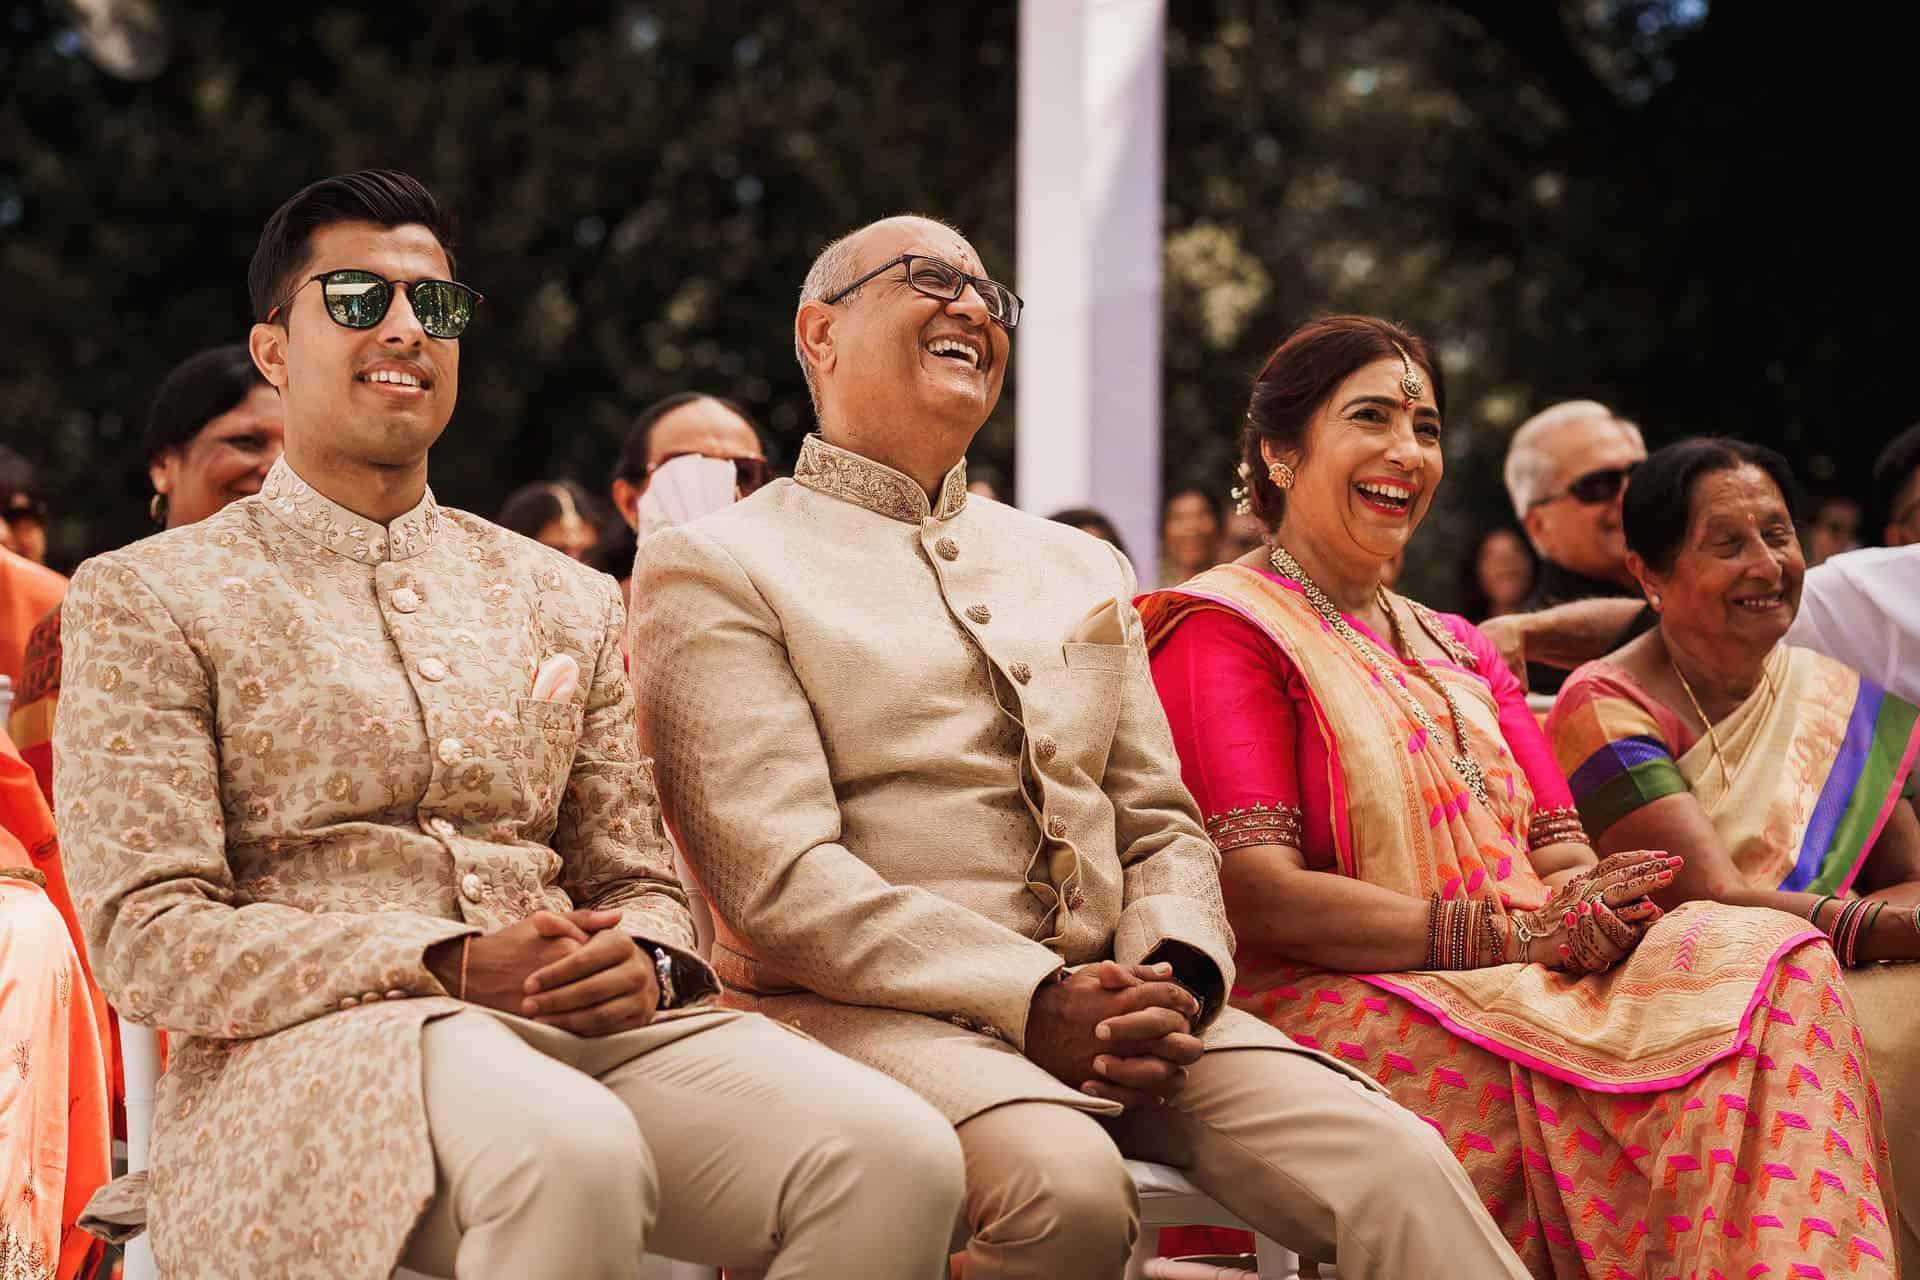 tenuta di artimino indian wedding tuscany